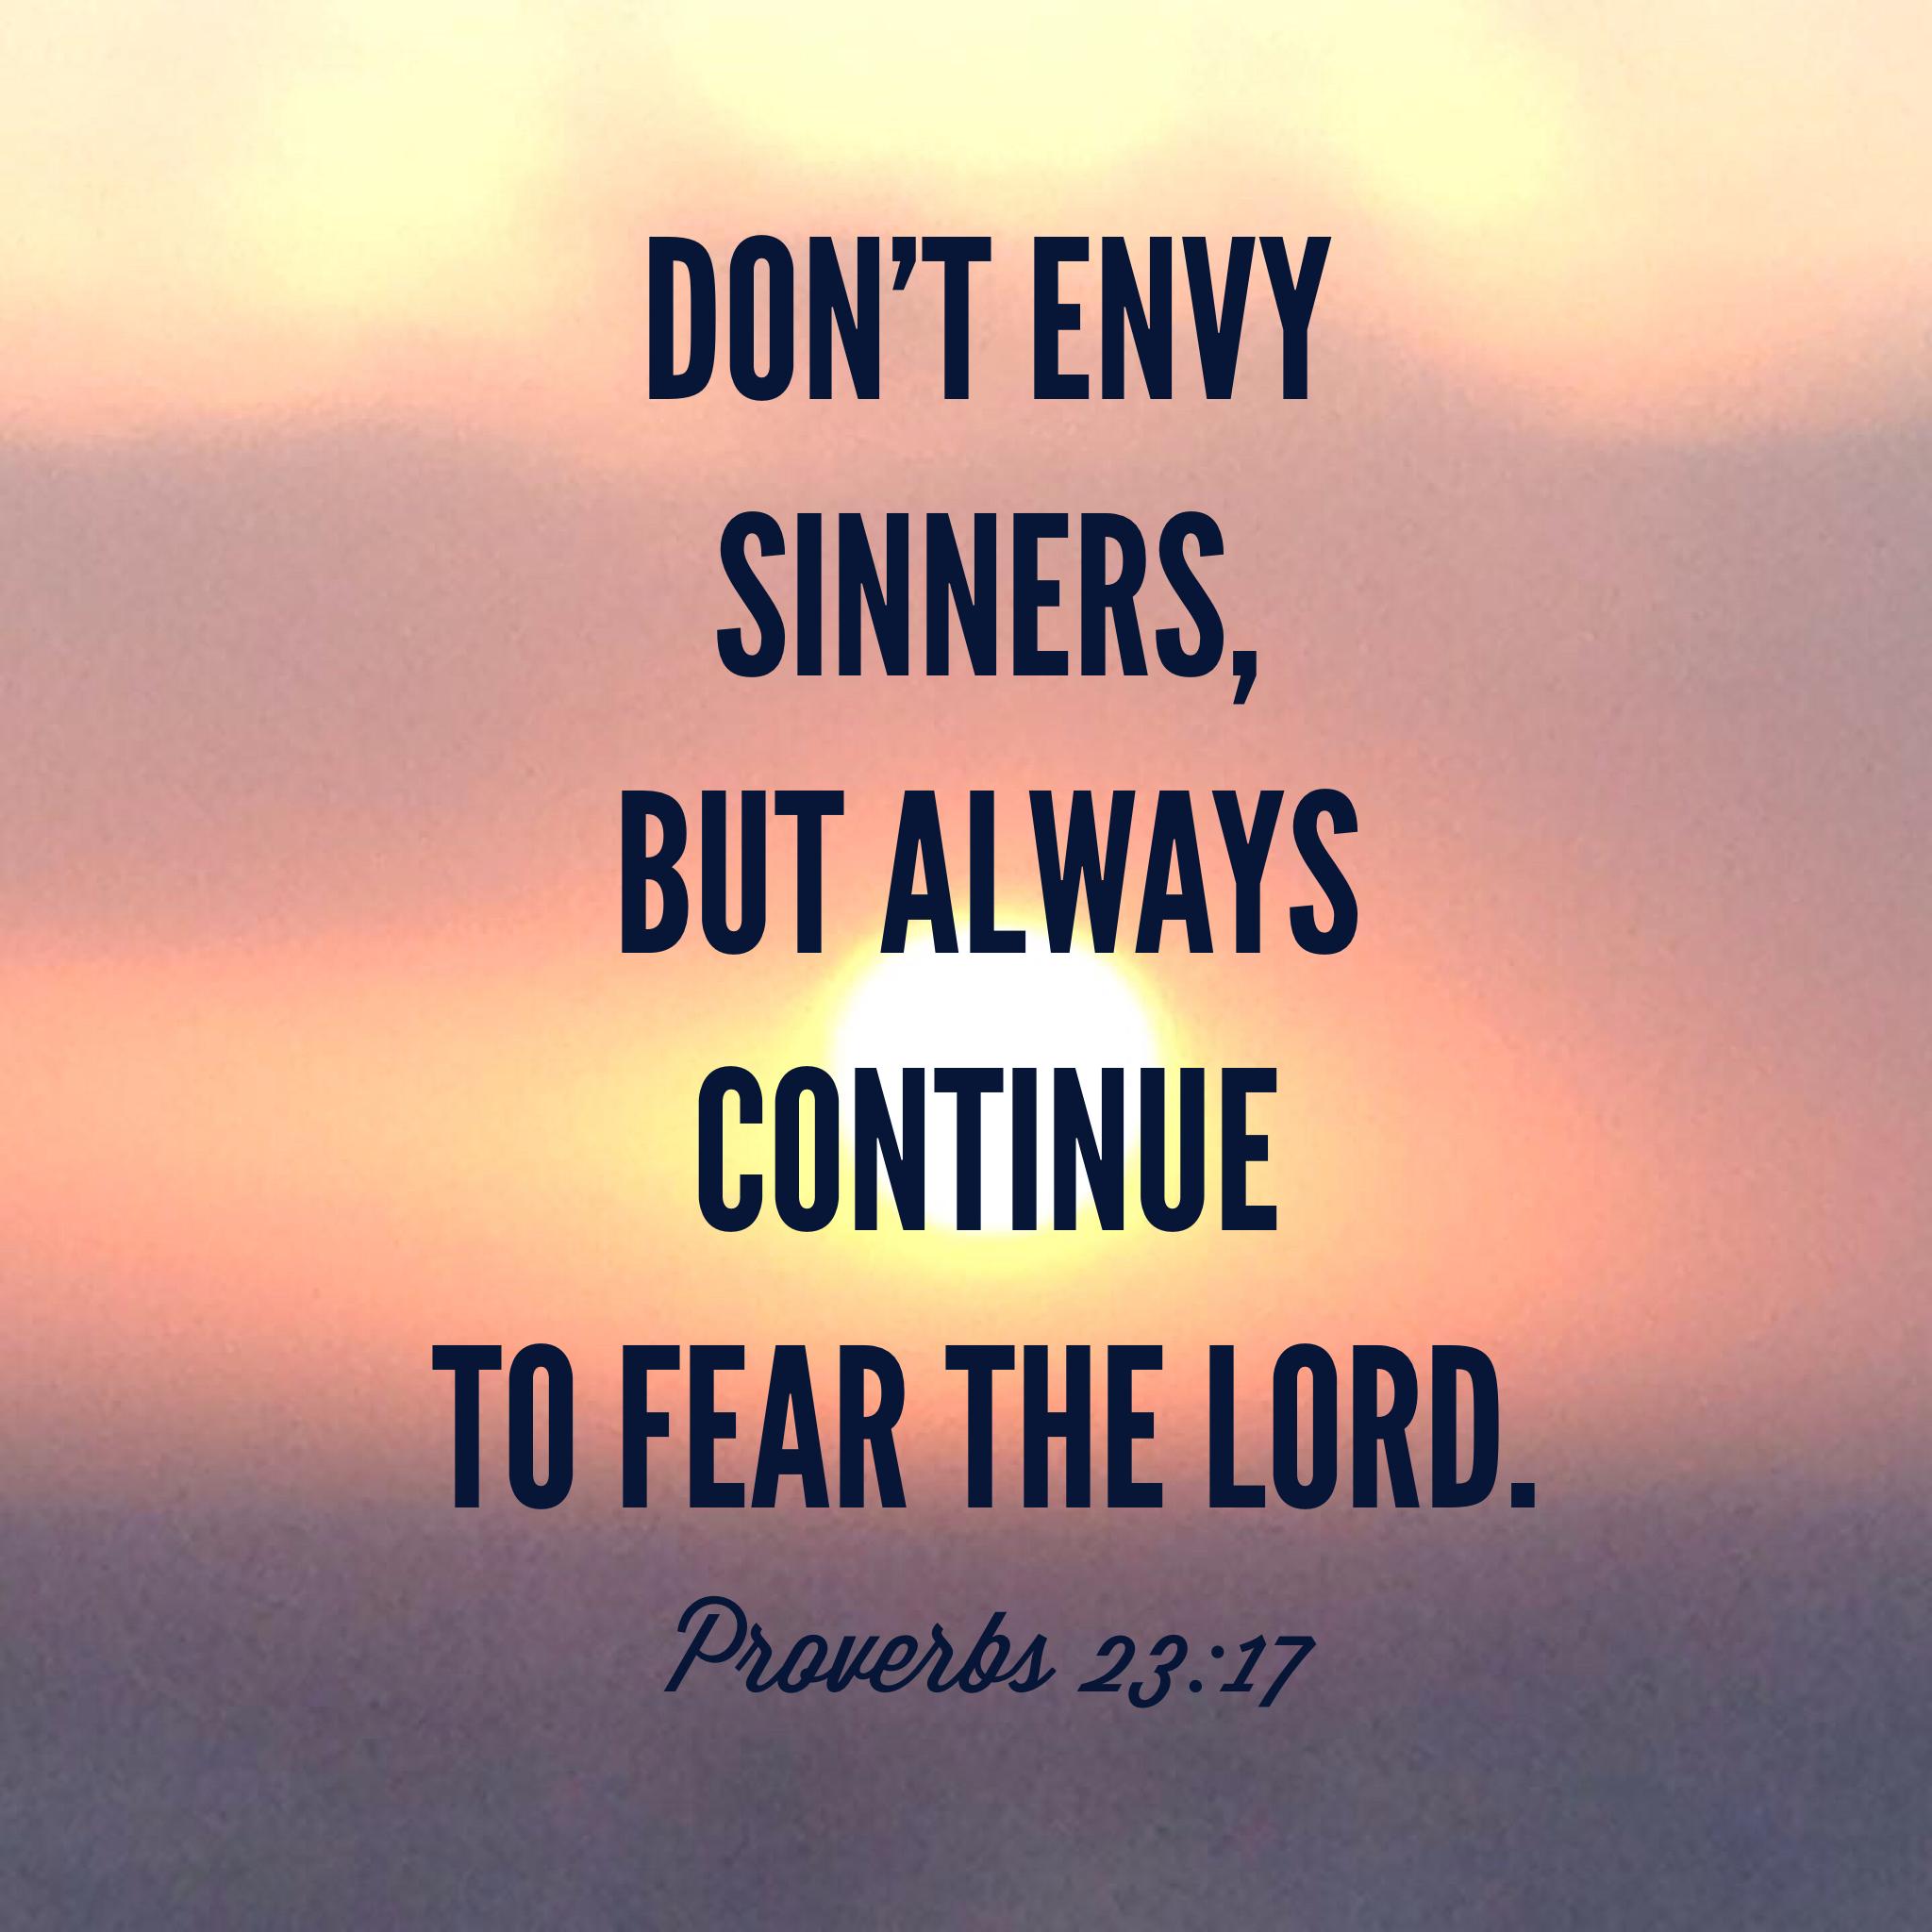 Bible Verses About Determination: #bibe #verse #scripture #motivation #proverbs #NKJV